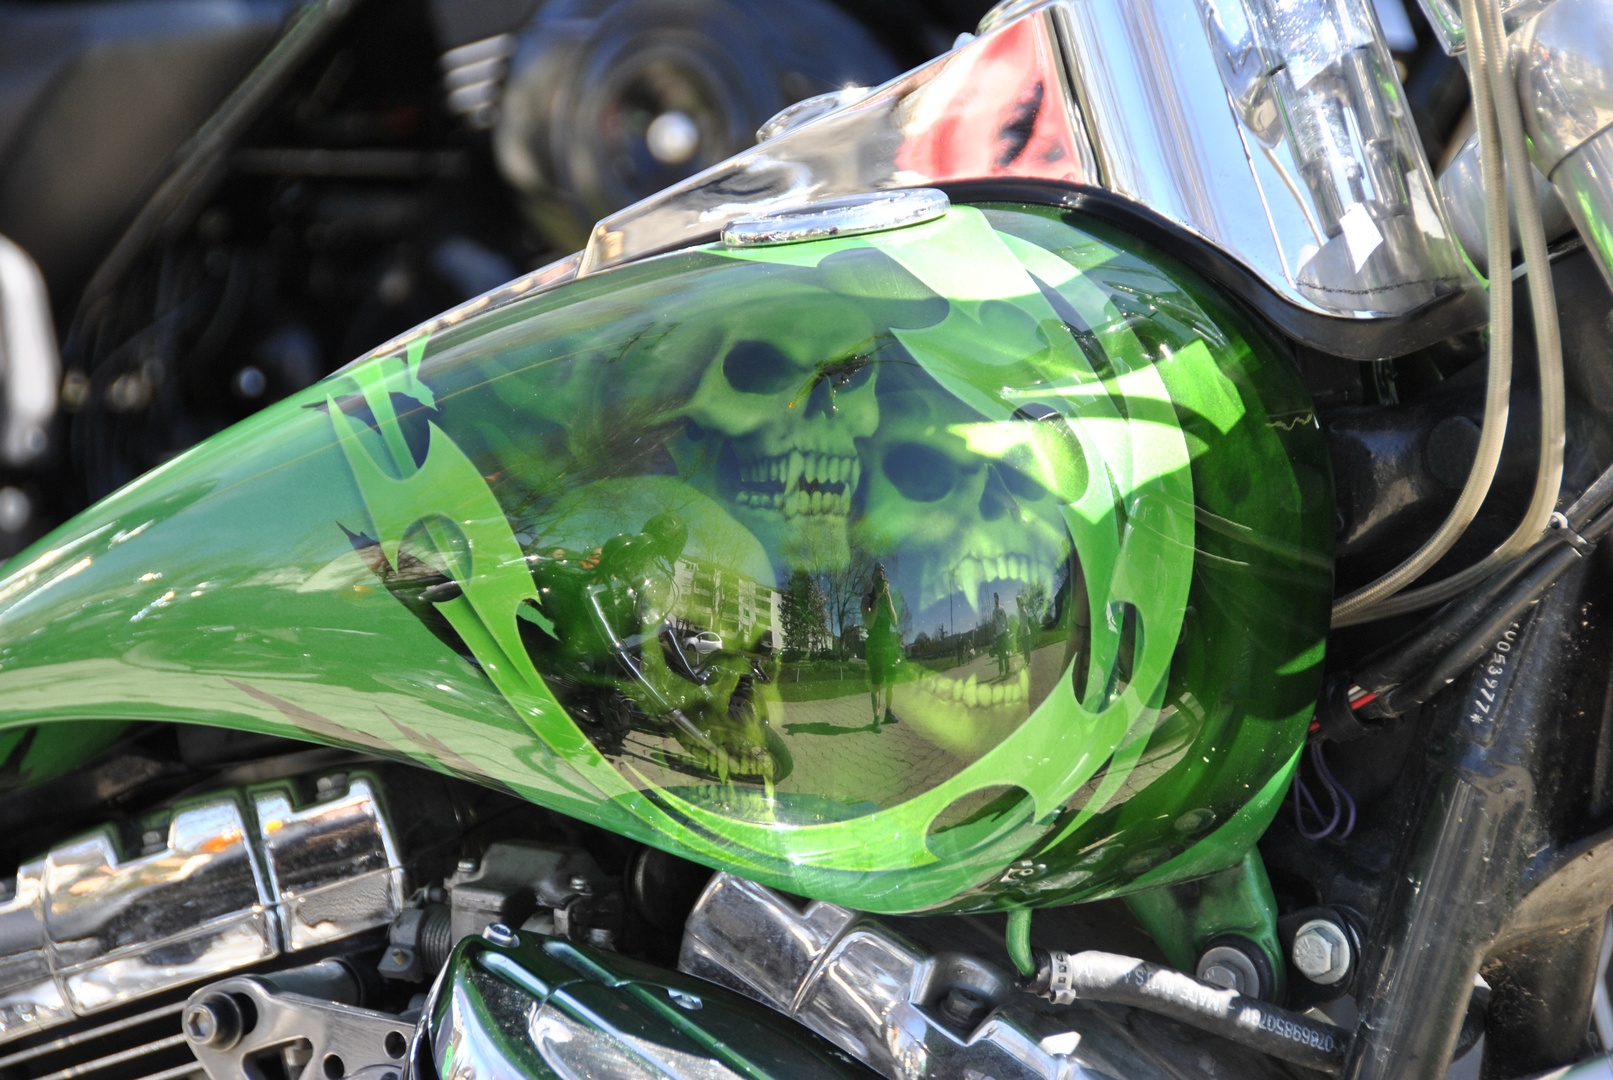 motorrad fotos